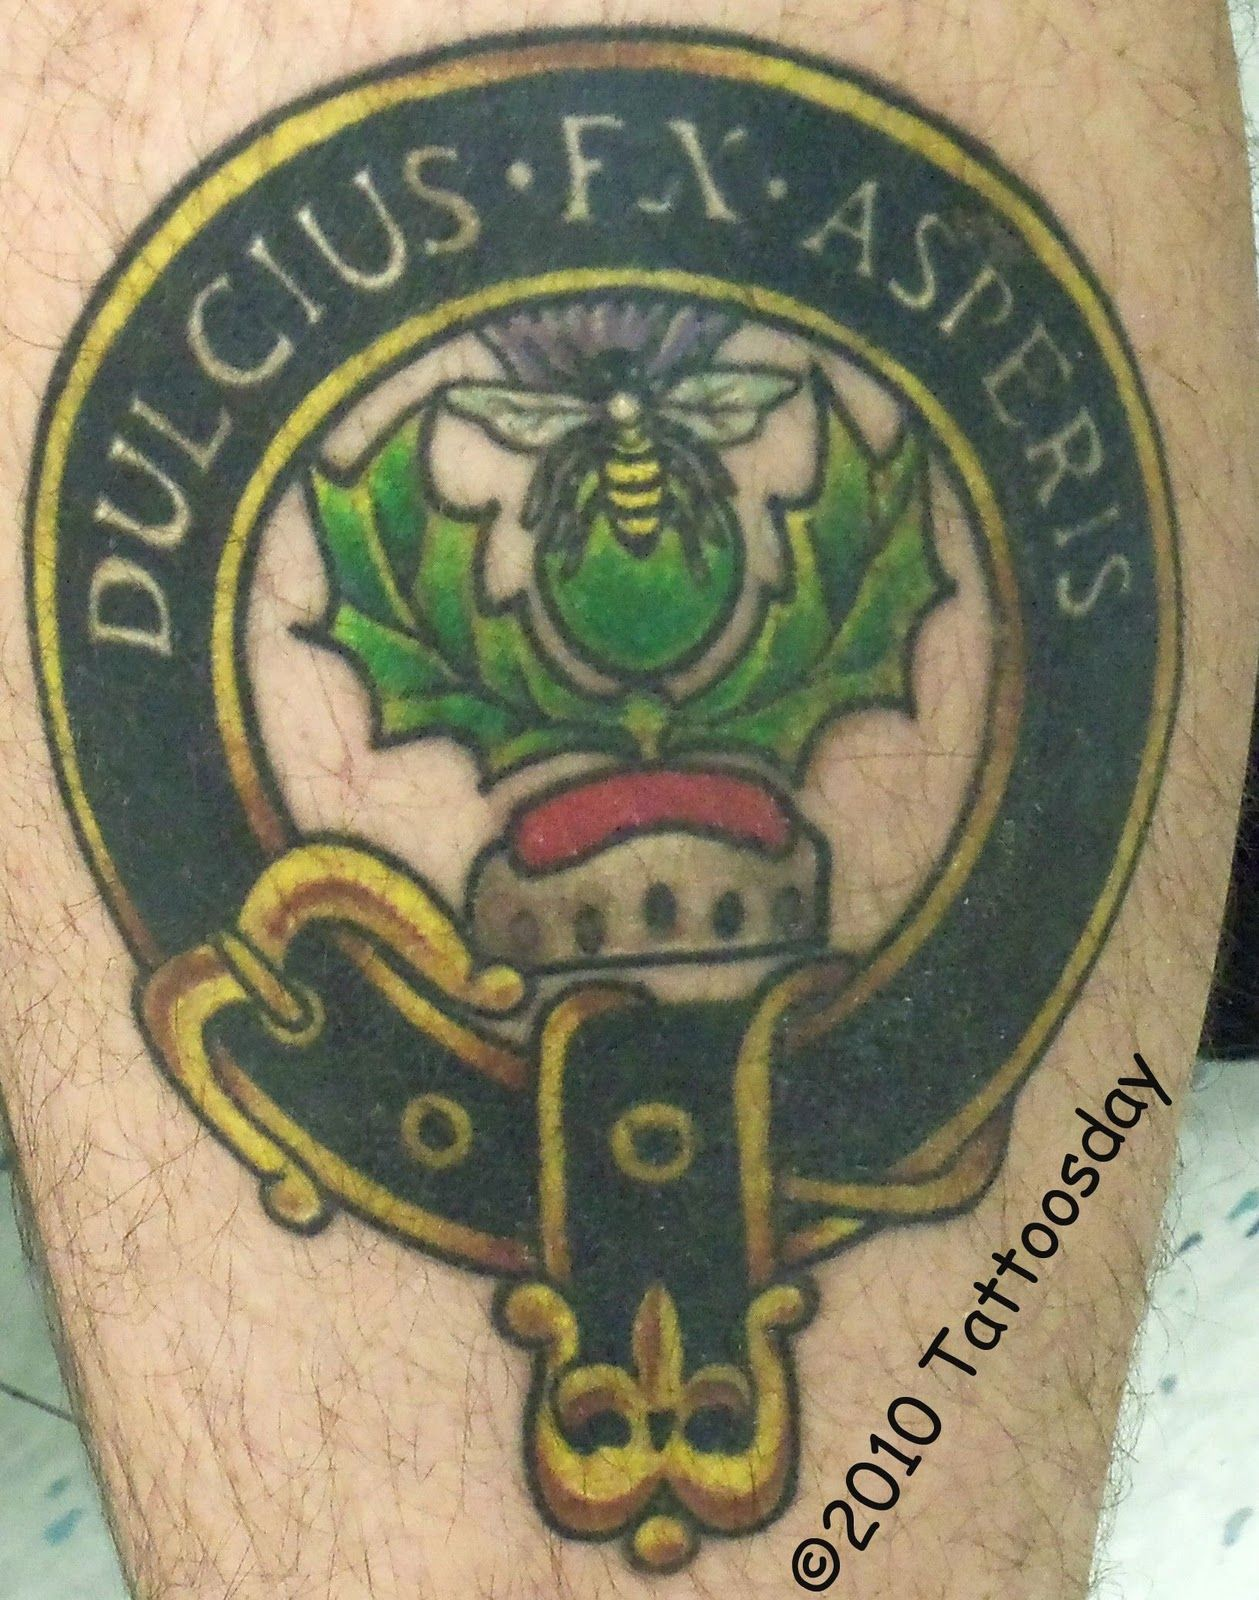 8603c25cf Clan motto tattoo :) #tattoo #tattoos #ink #family #crest #coatofarms  #heraldry #genealogy #shield